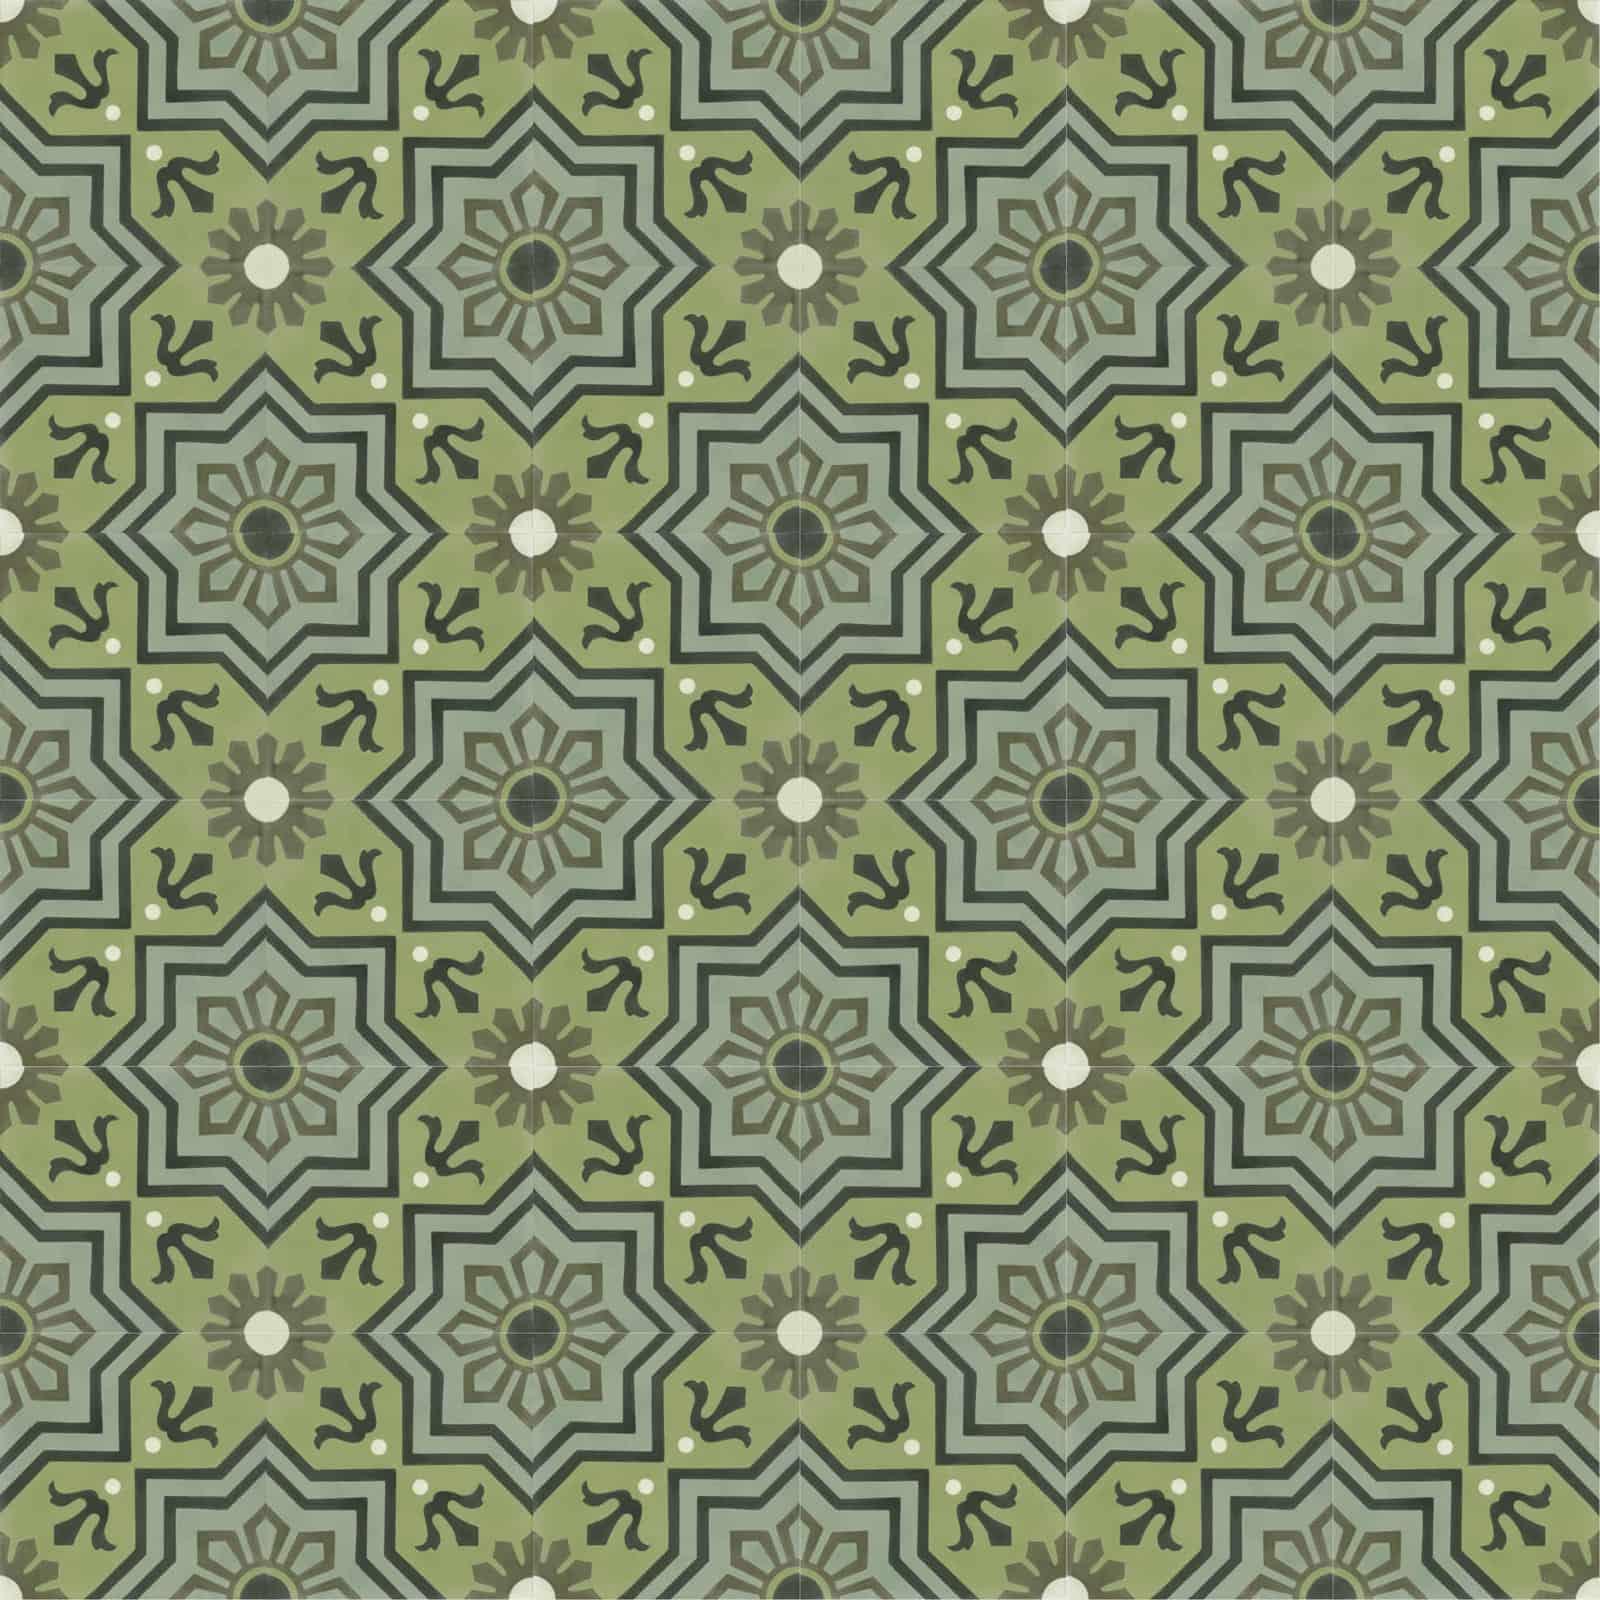 zementfliesen-verlegemuster-nummer-13521-viaplatten | 13521